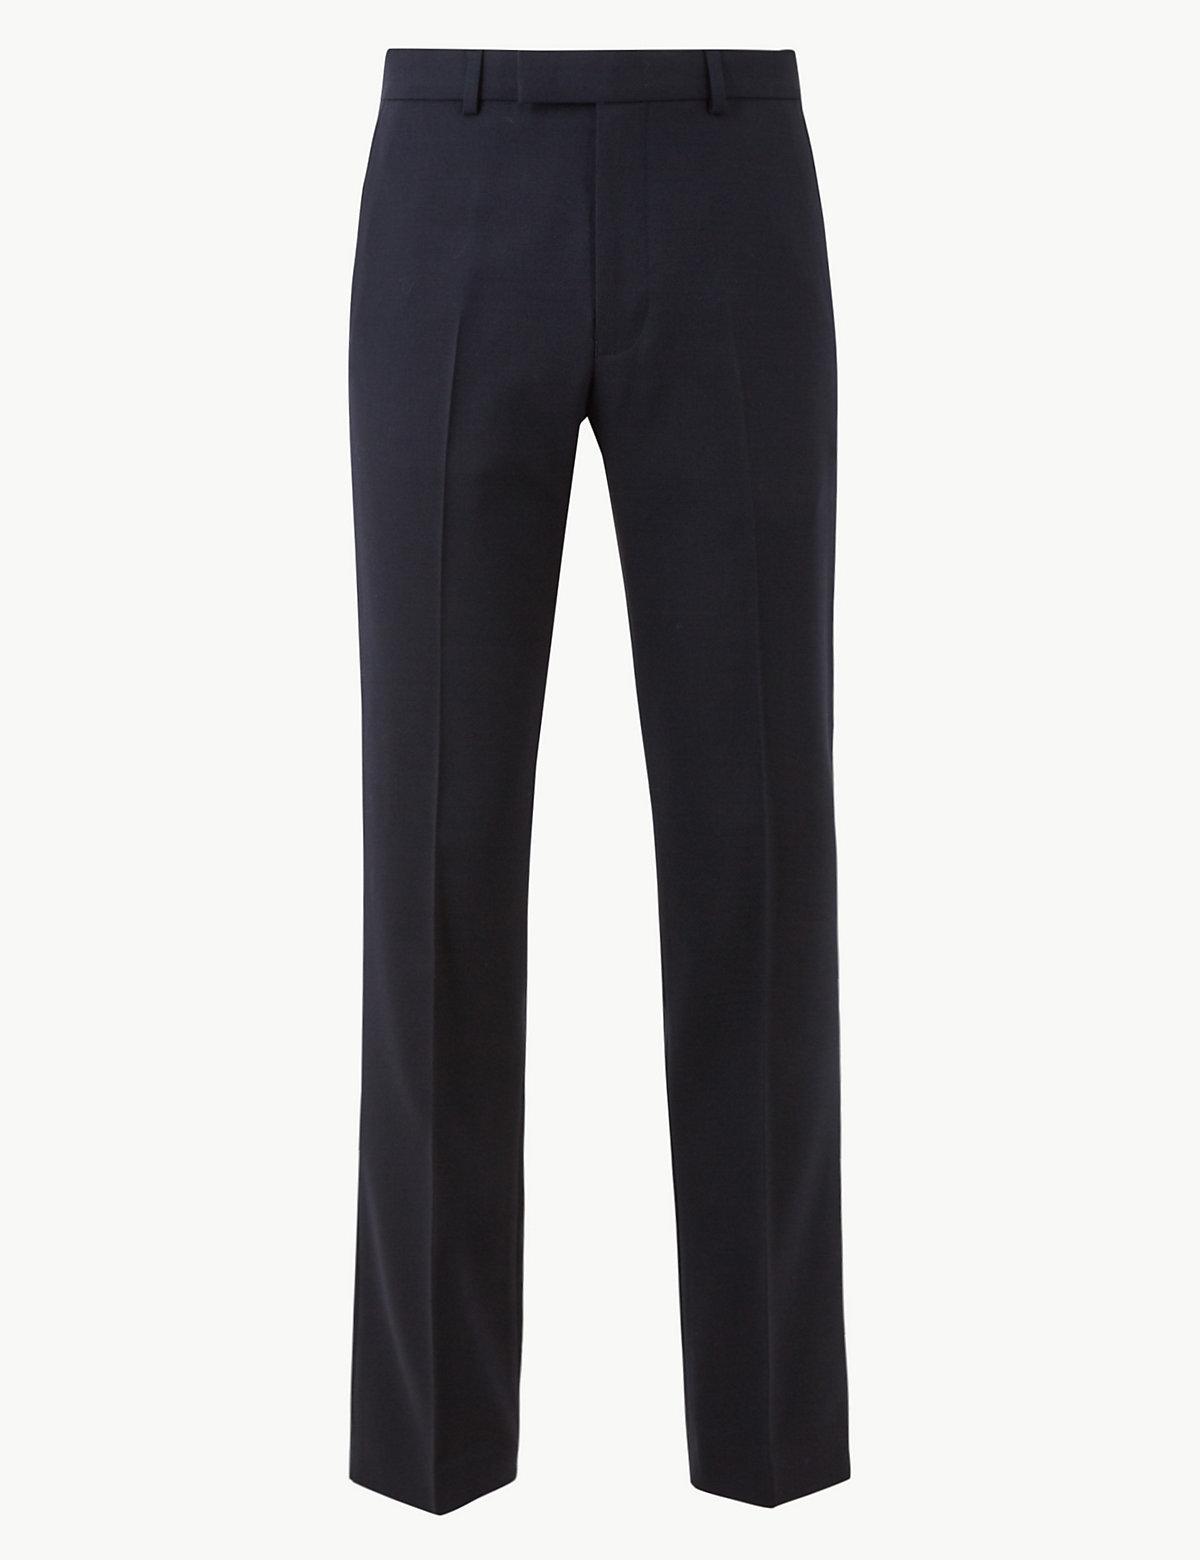 Классические мужские брюки без защипов M&S Collection. Цвет: темно-синий